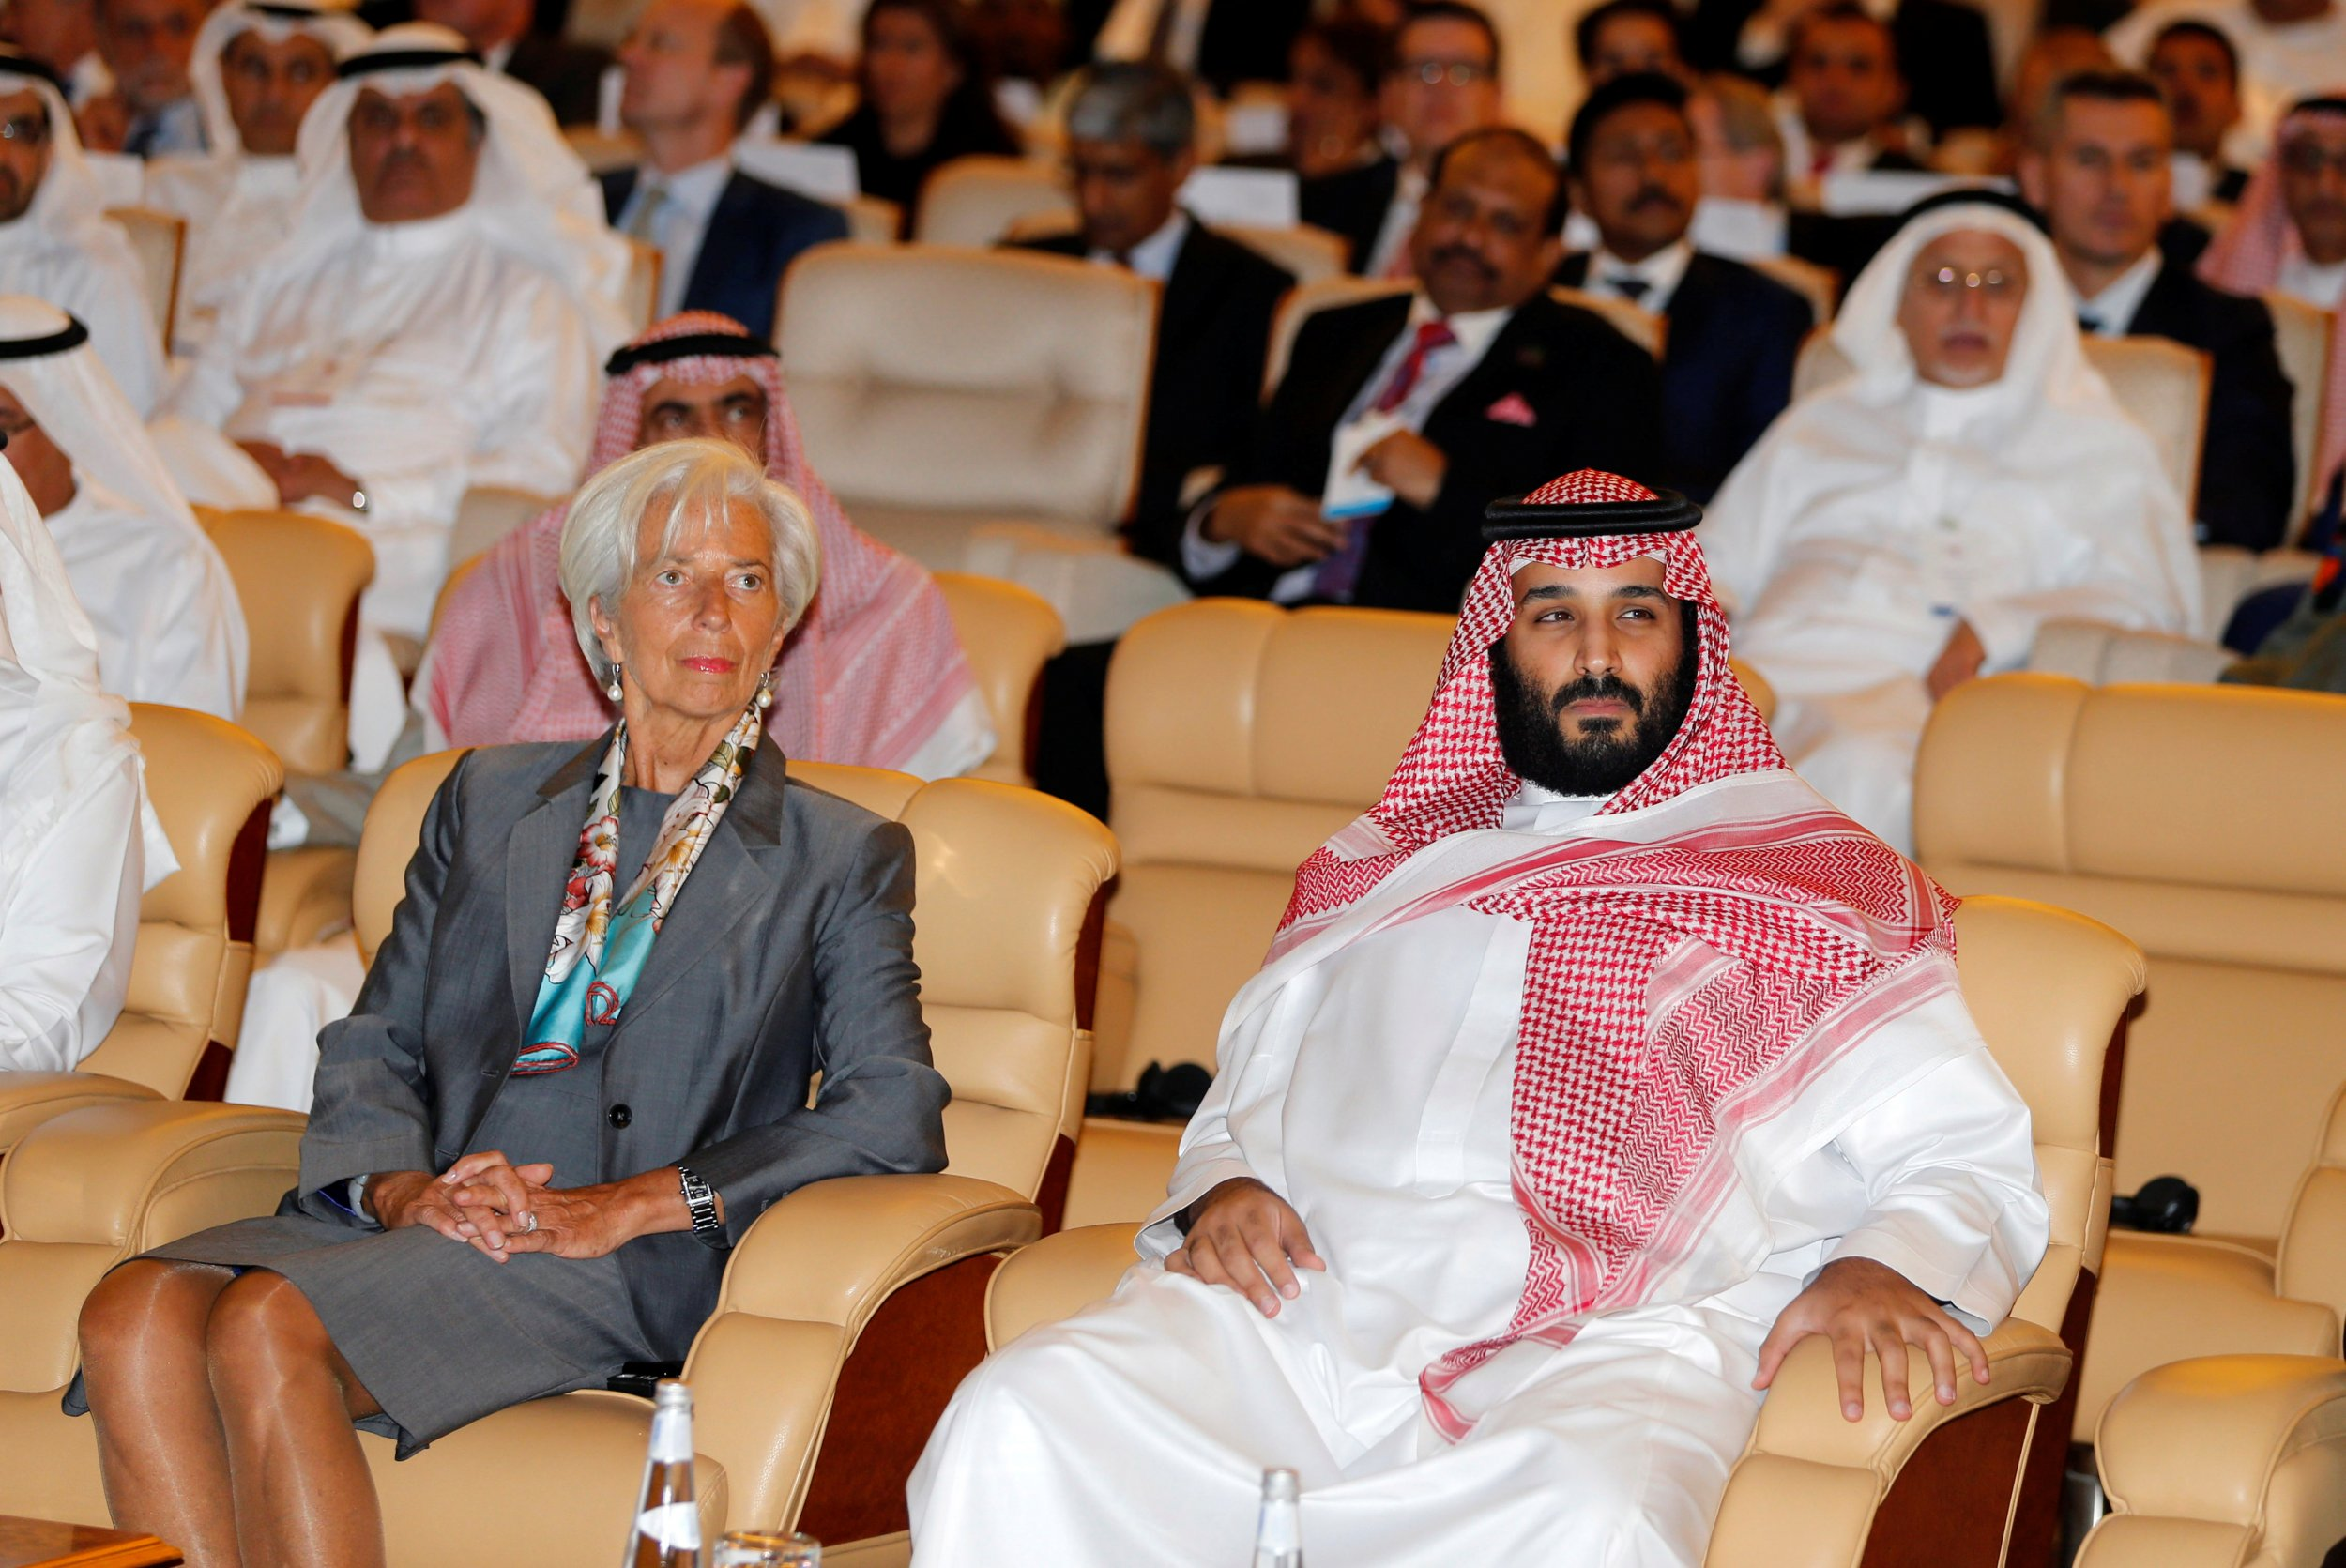 Saudi_Arabia_LaGarde